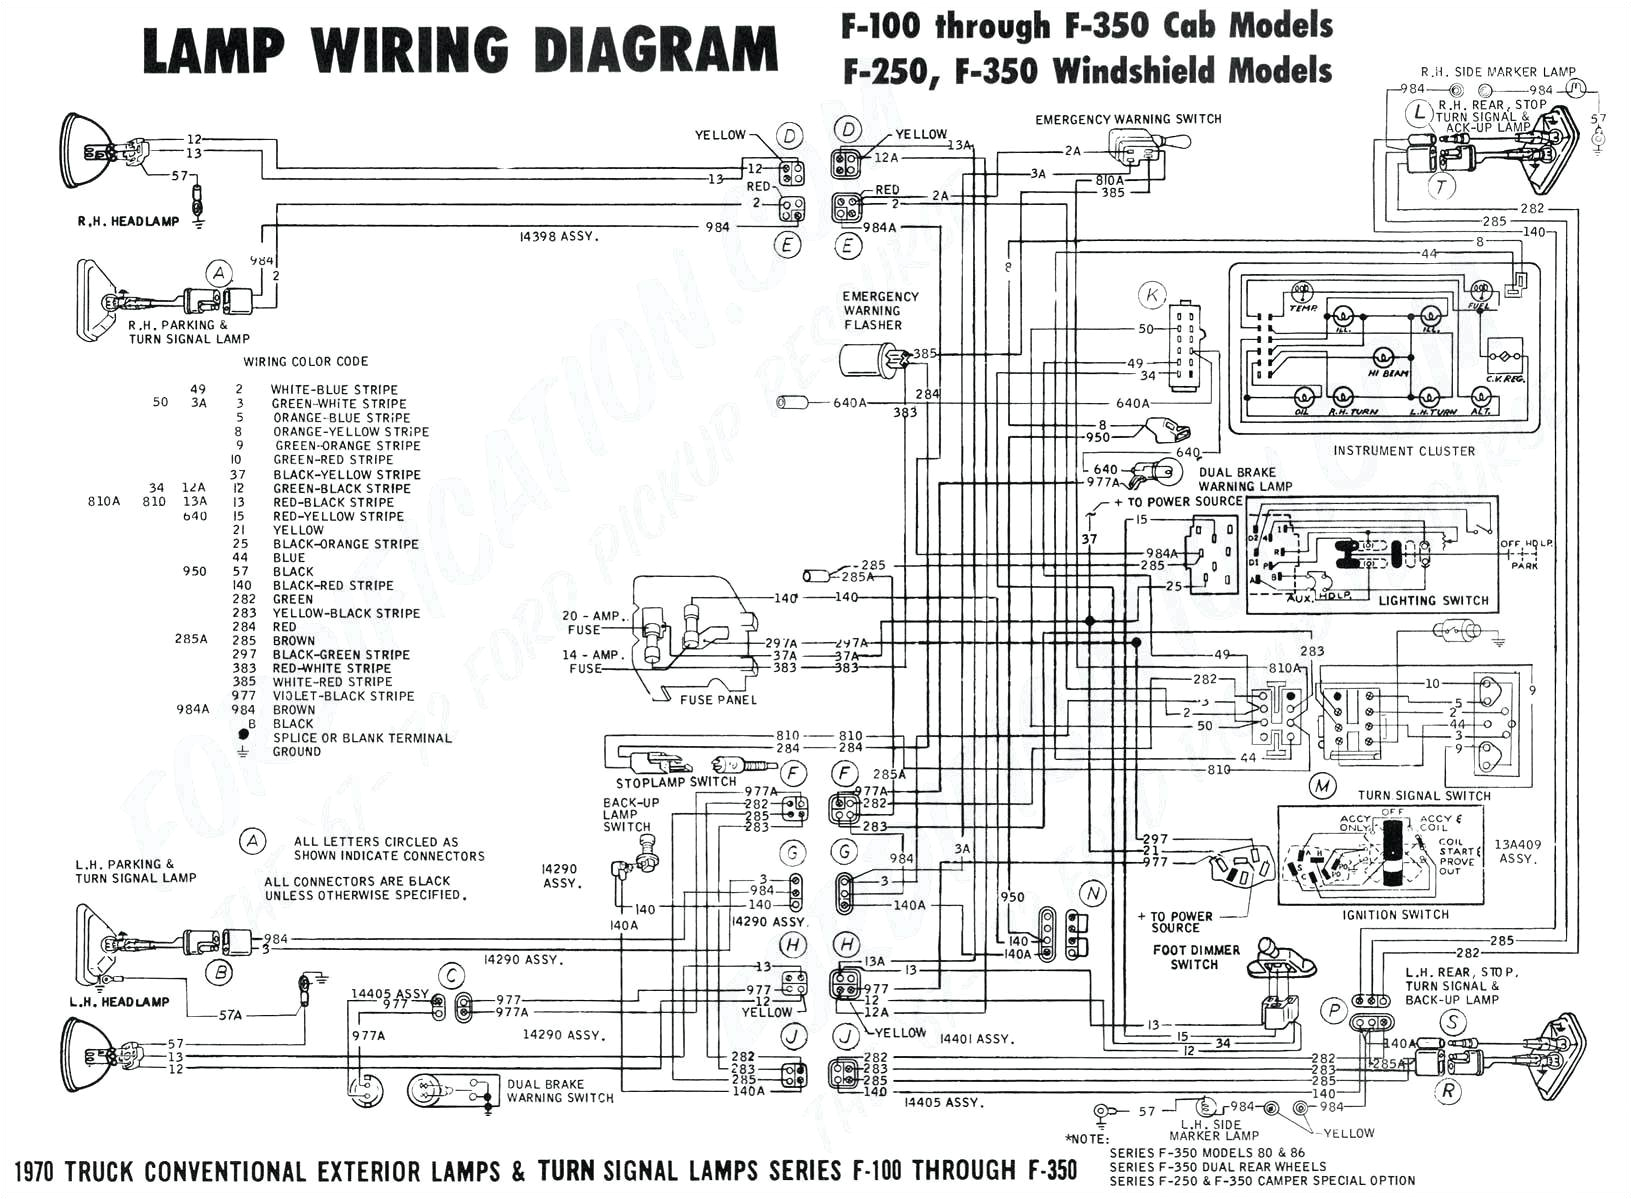 cooper wiring diagram wall pack wiring diagram user cooper wiring diagram wall pack